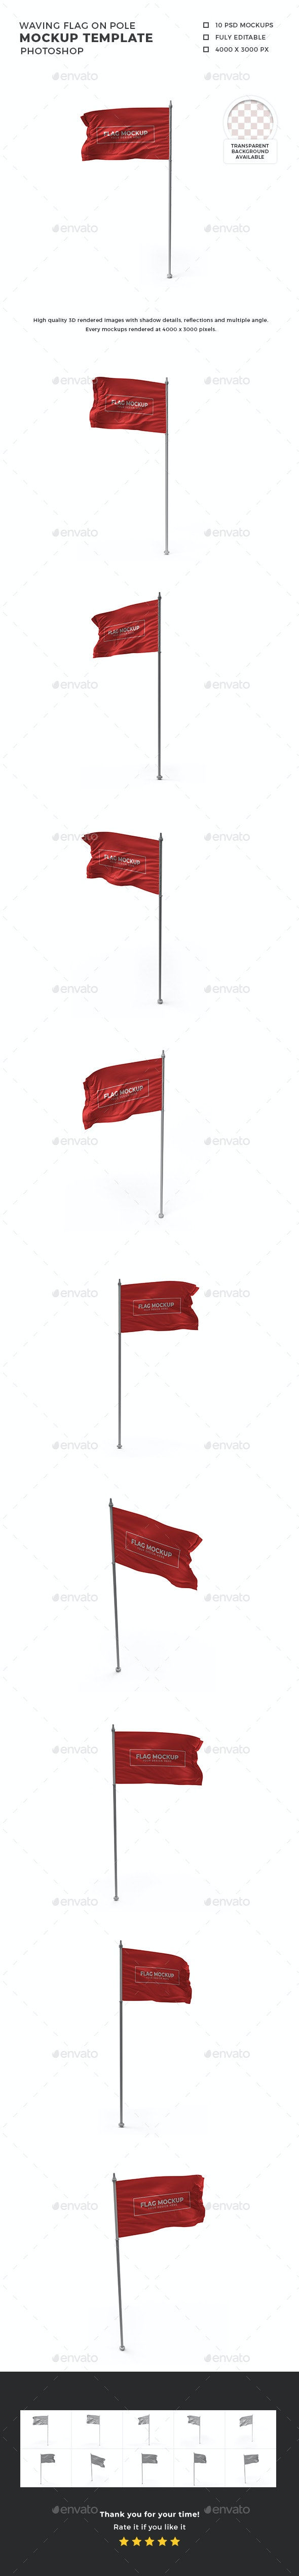 Waving Flag on Pole Mockup Template Set - Miscellaneous Product Mock-Ups